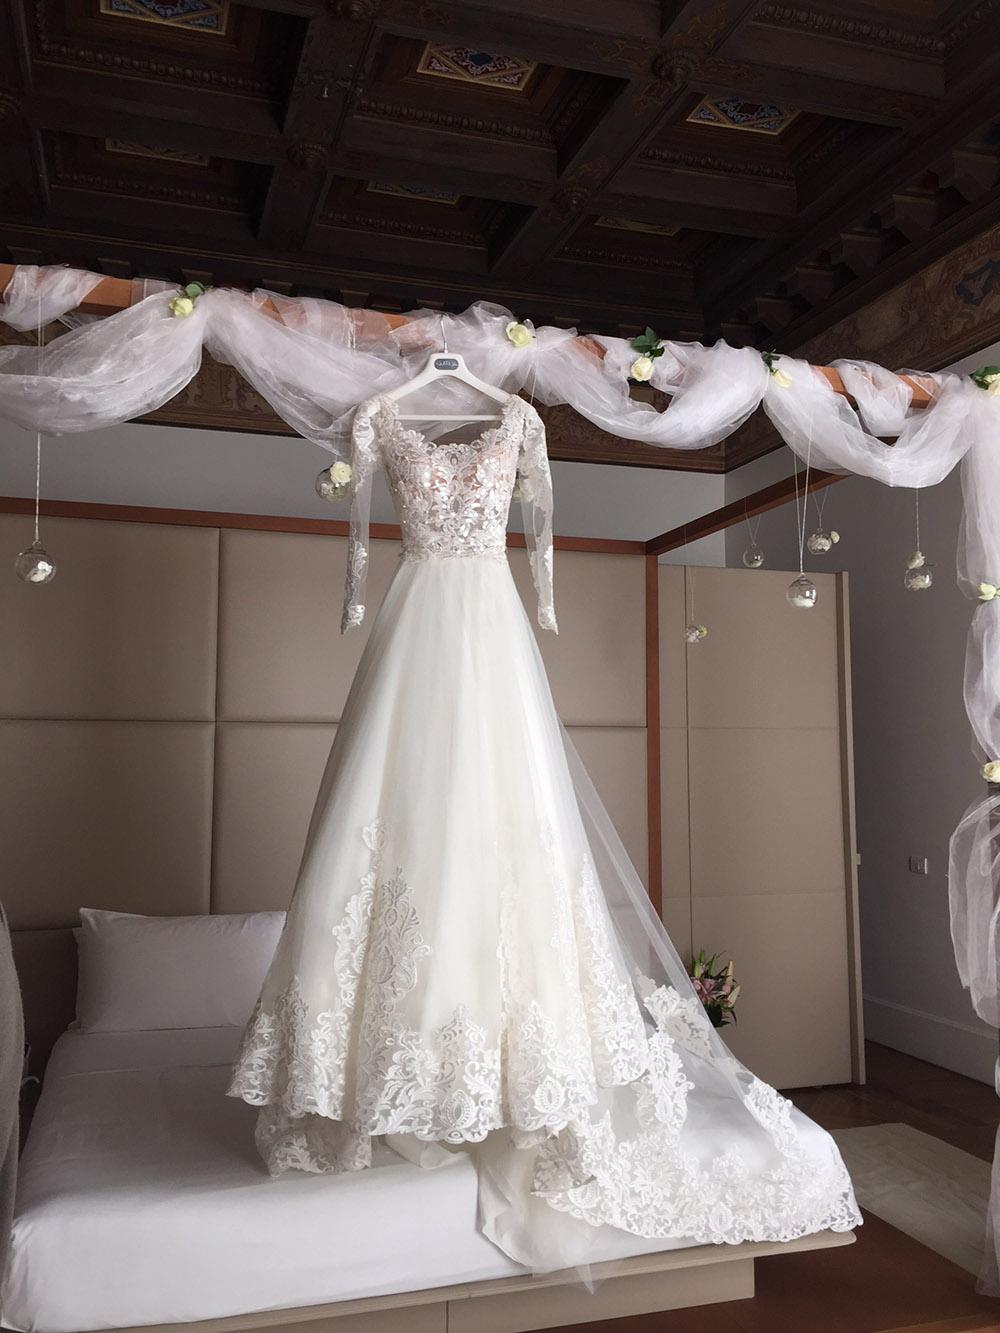 3-armenian-italian-wedding-in-rome-annartstyle-news.JPG